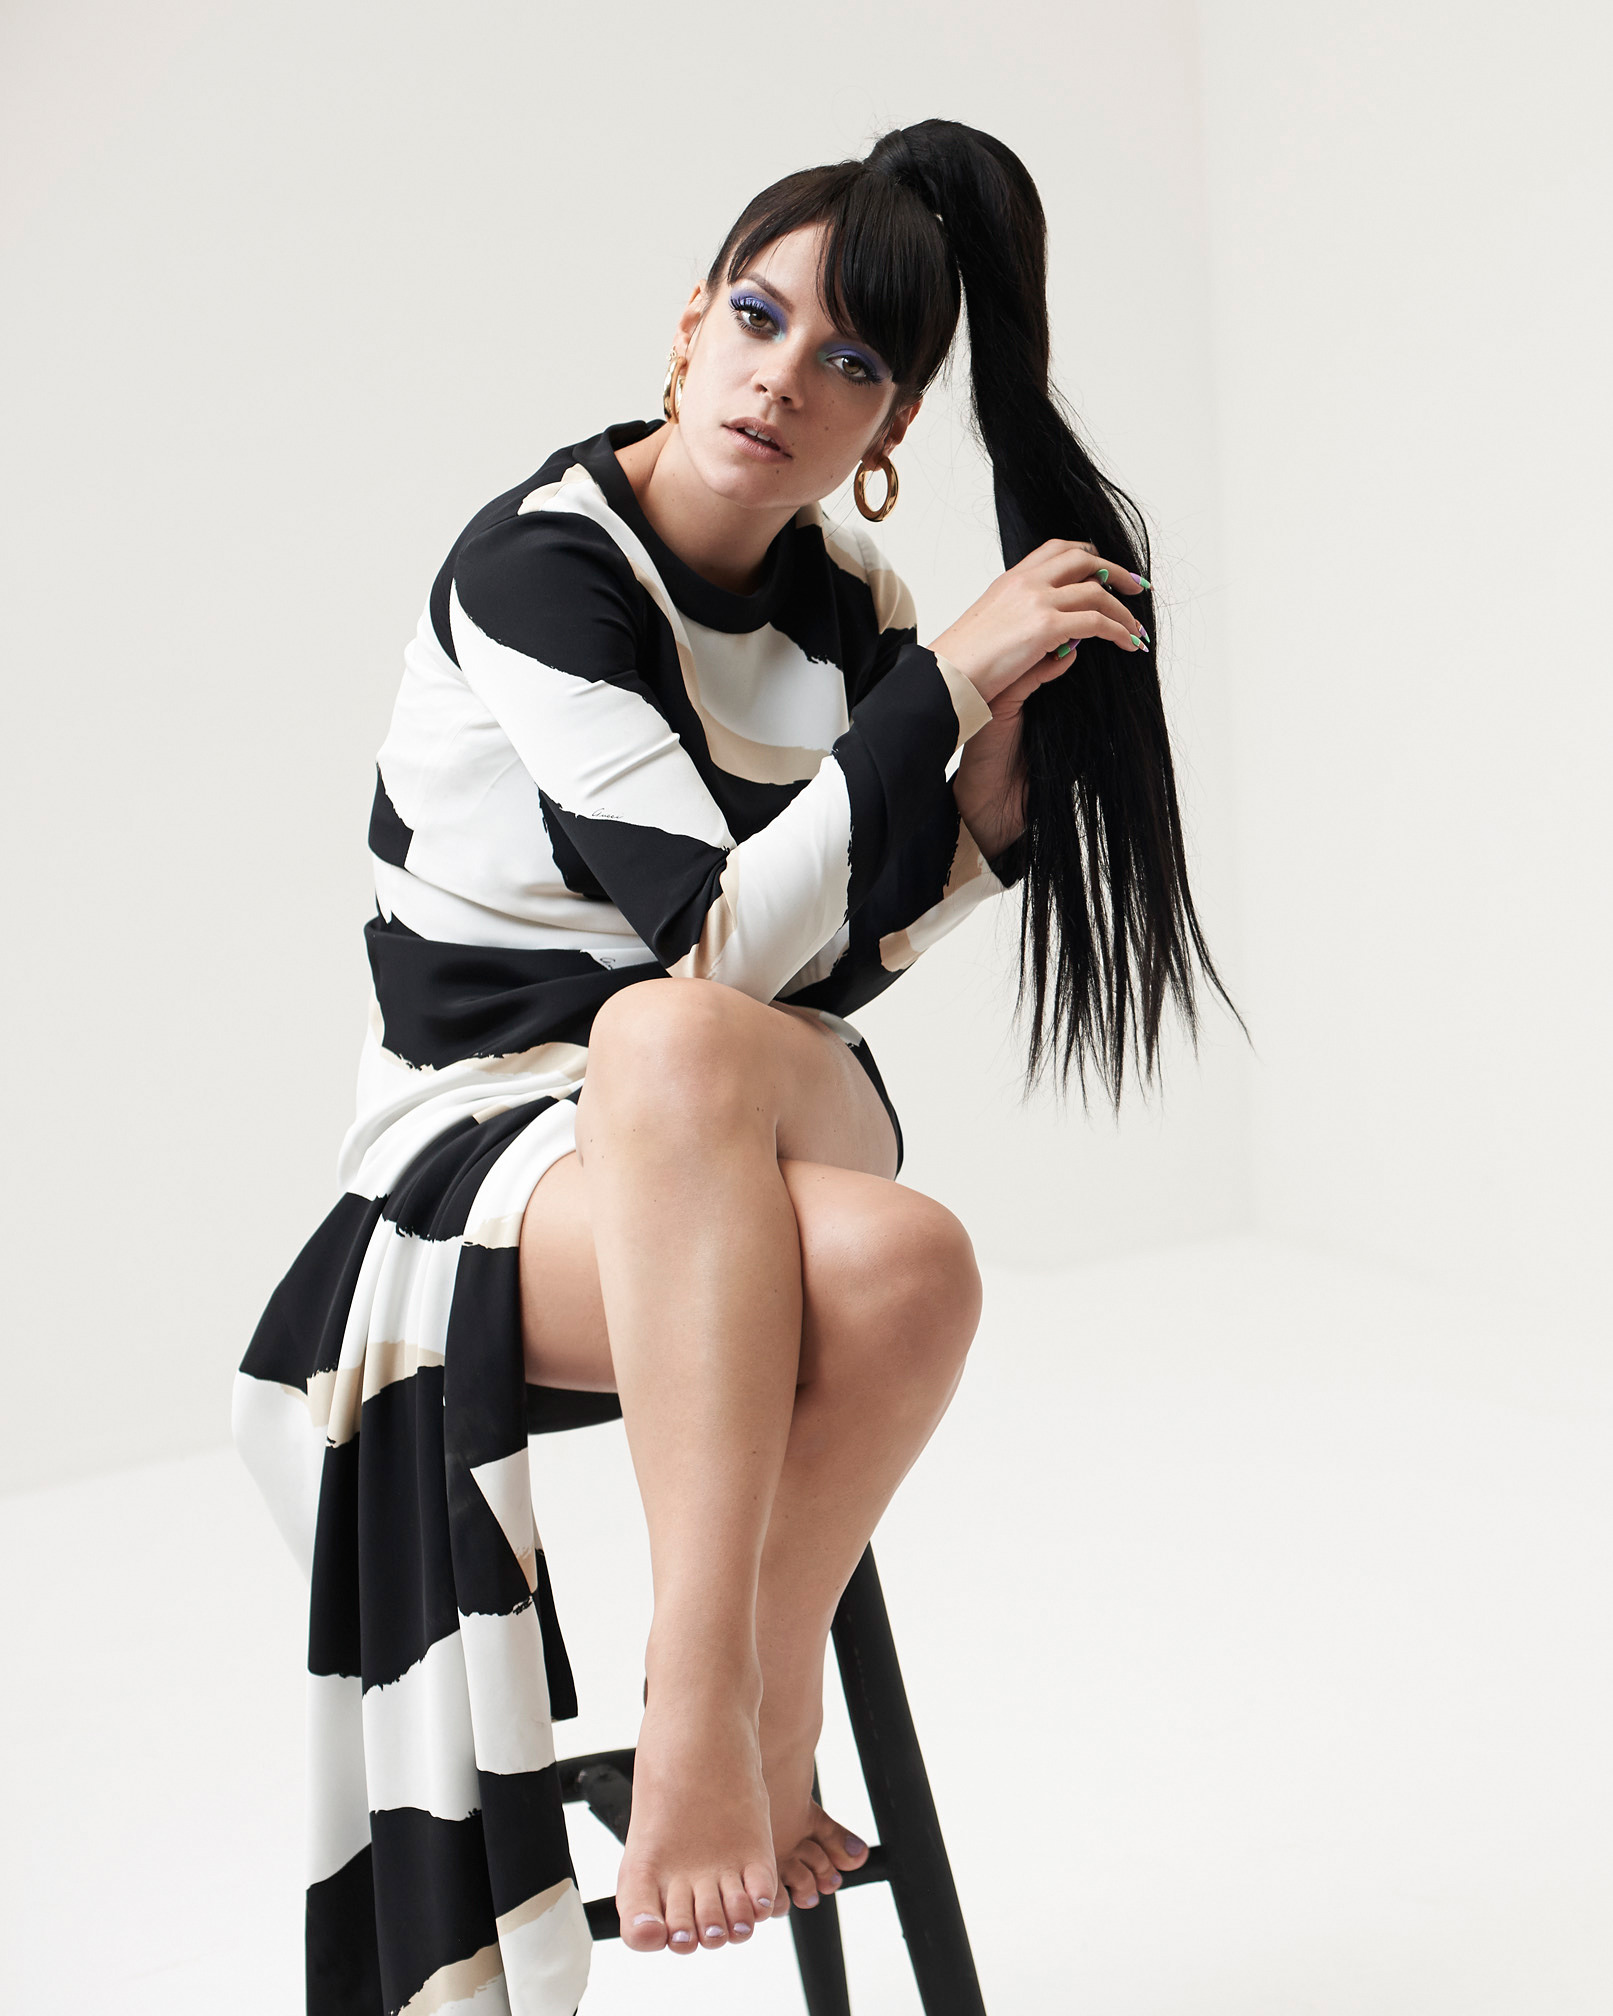 Gianna michaels dress